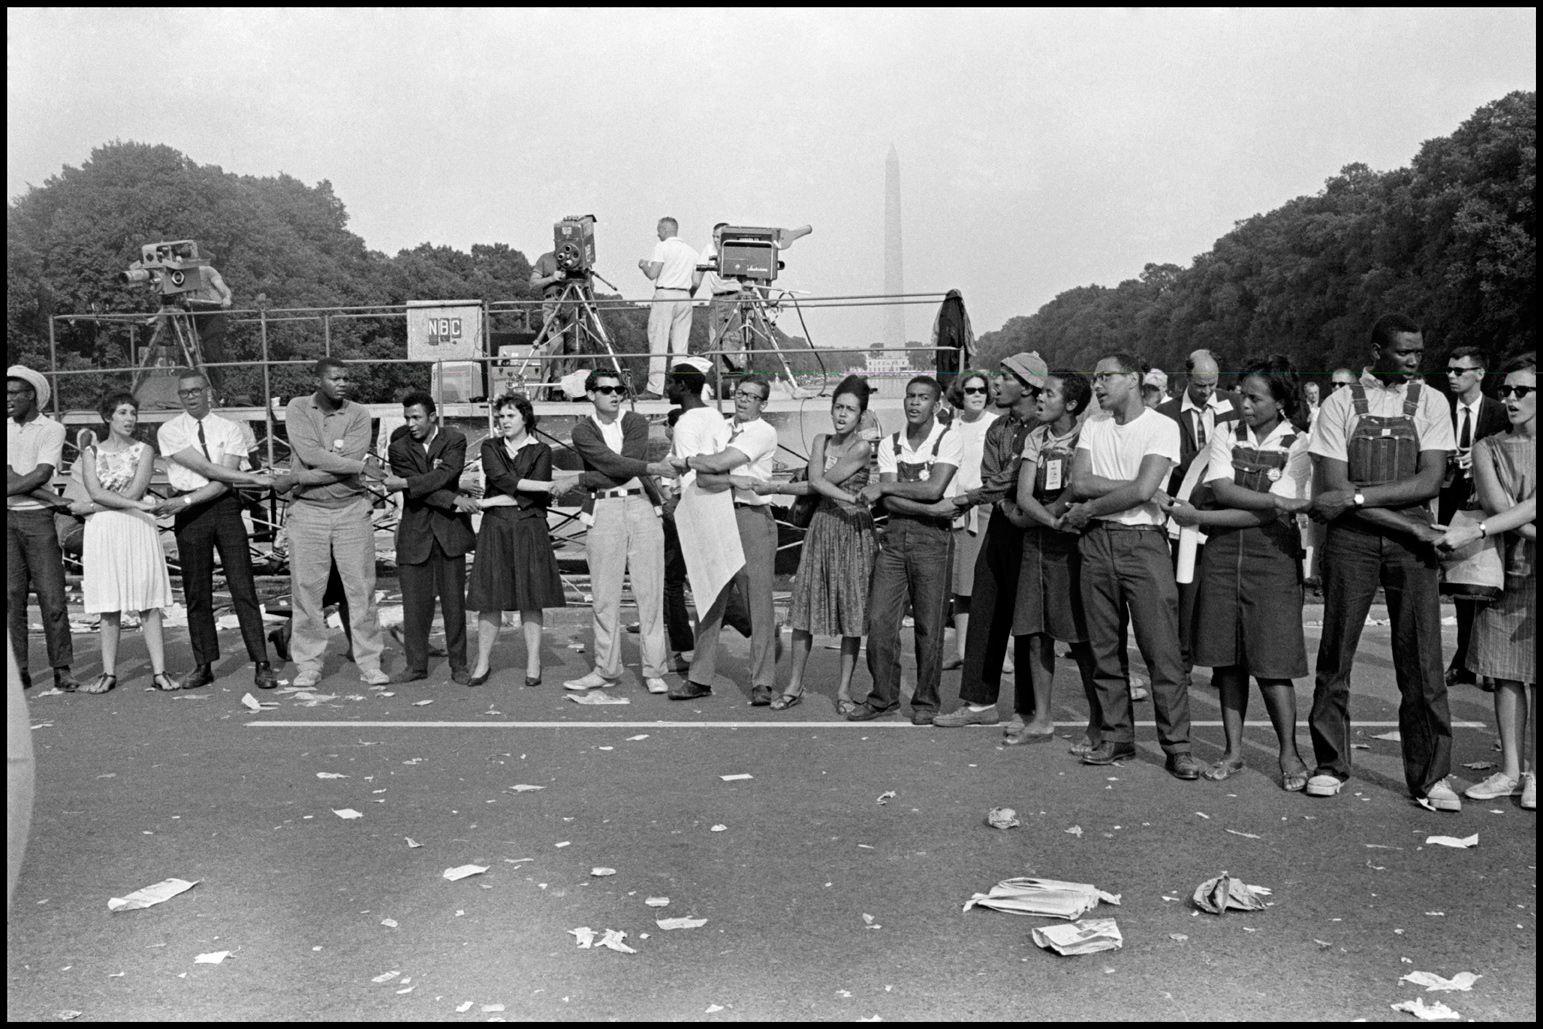 Protest In Harmony Civil rights bill, Civil rights